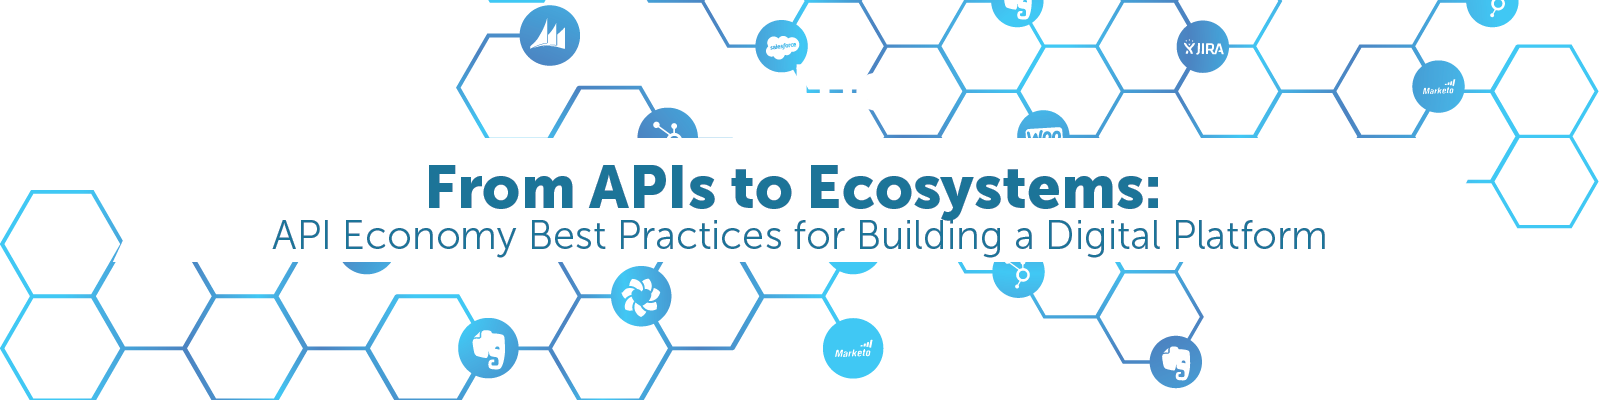 API Economy best practices for building a digital platform